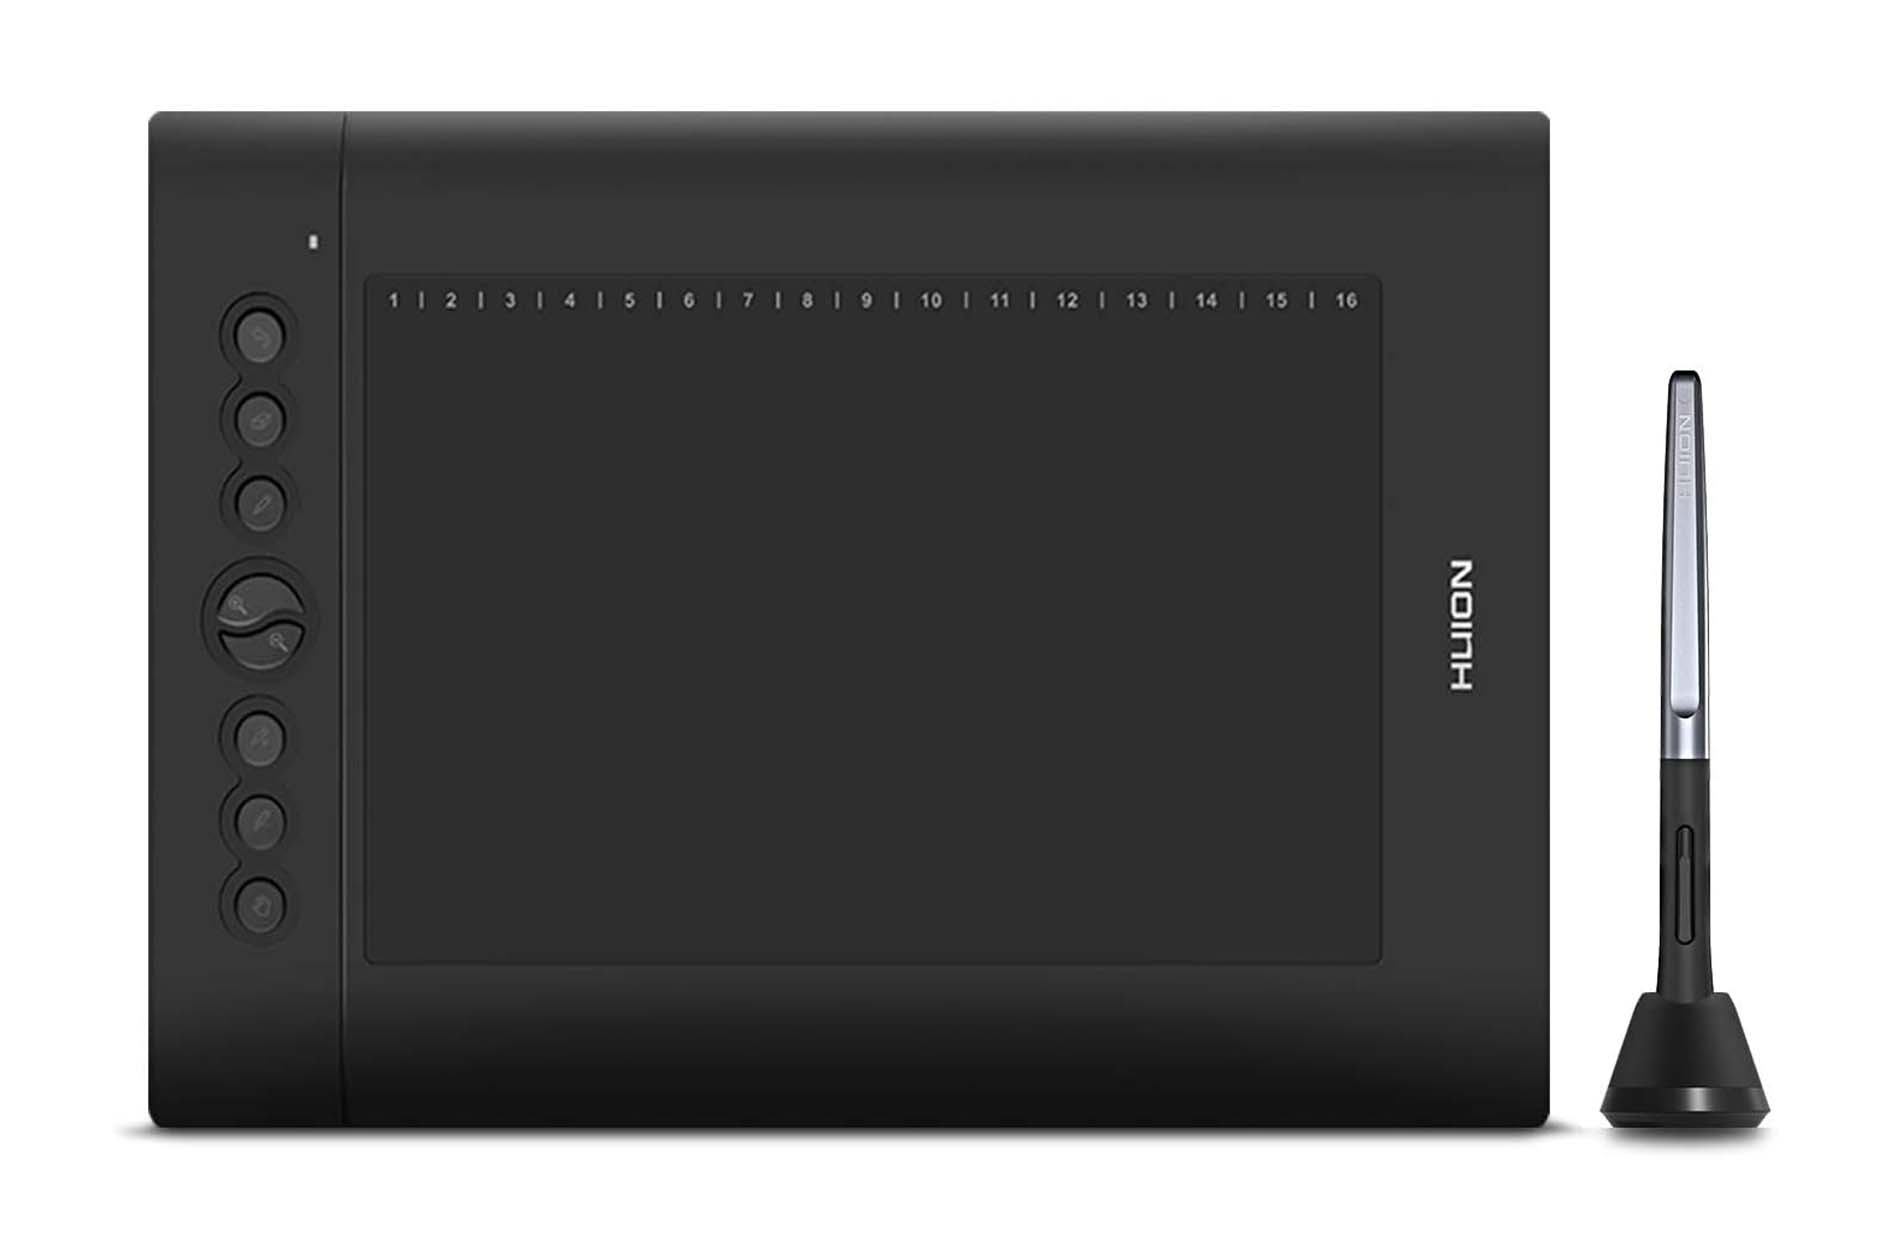 Huion H61PRO V2 - Best tablet for beginners